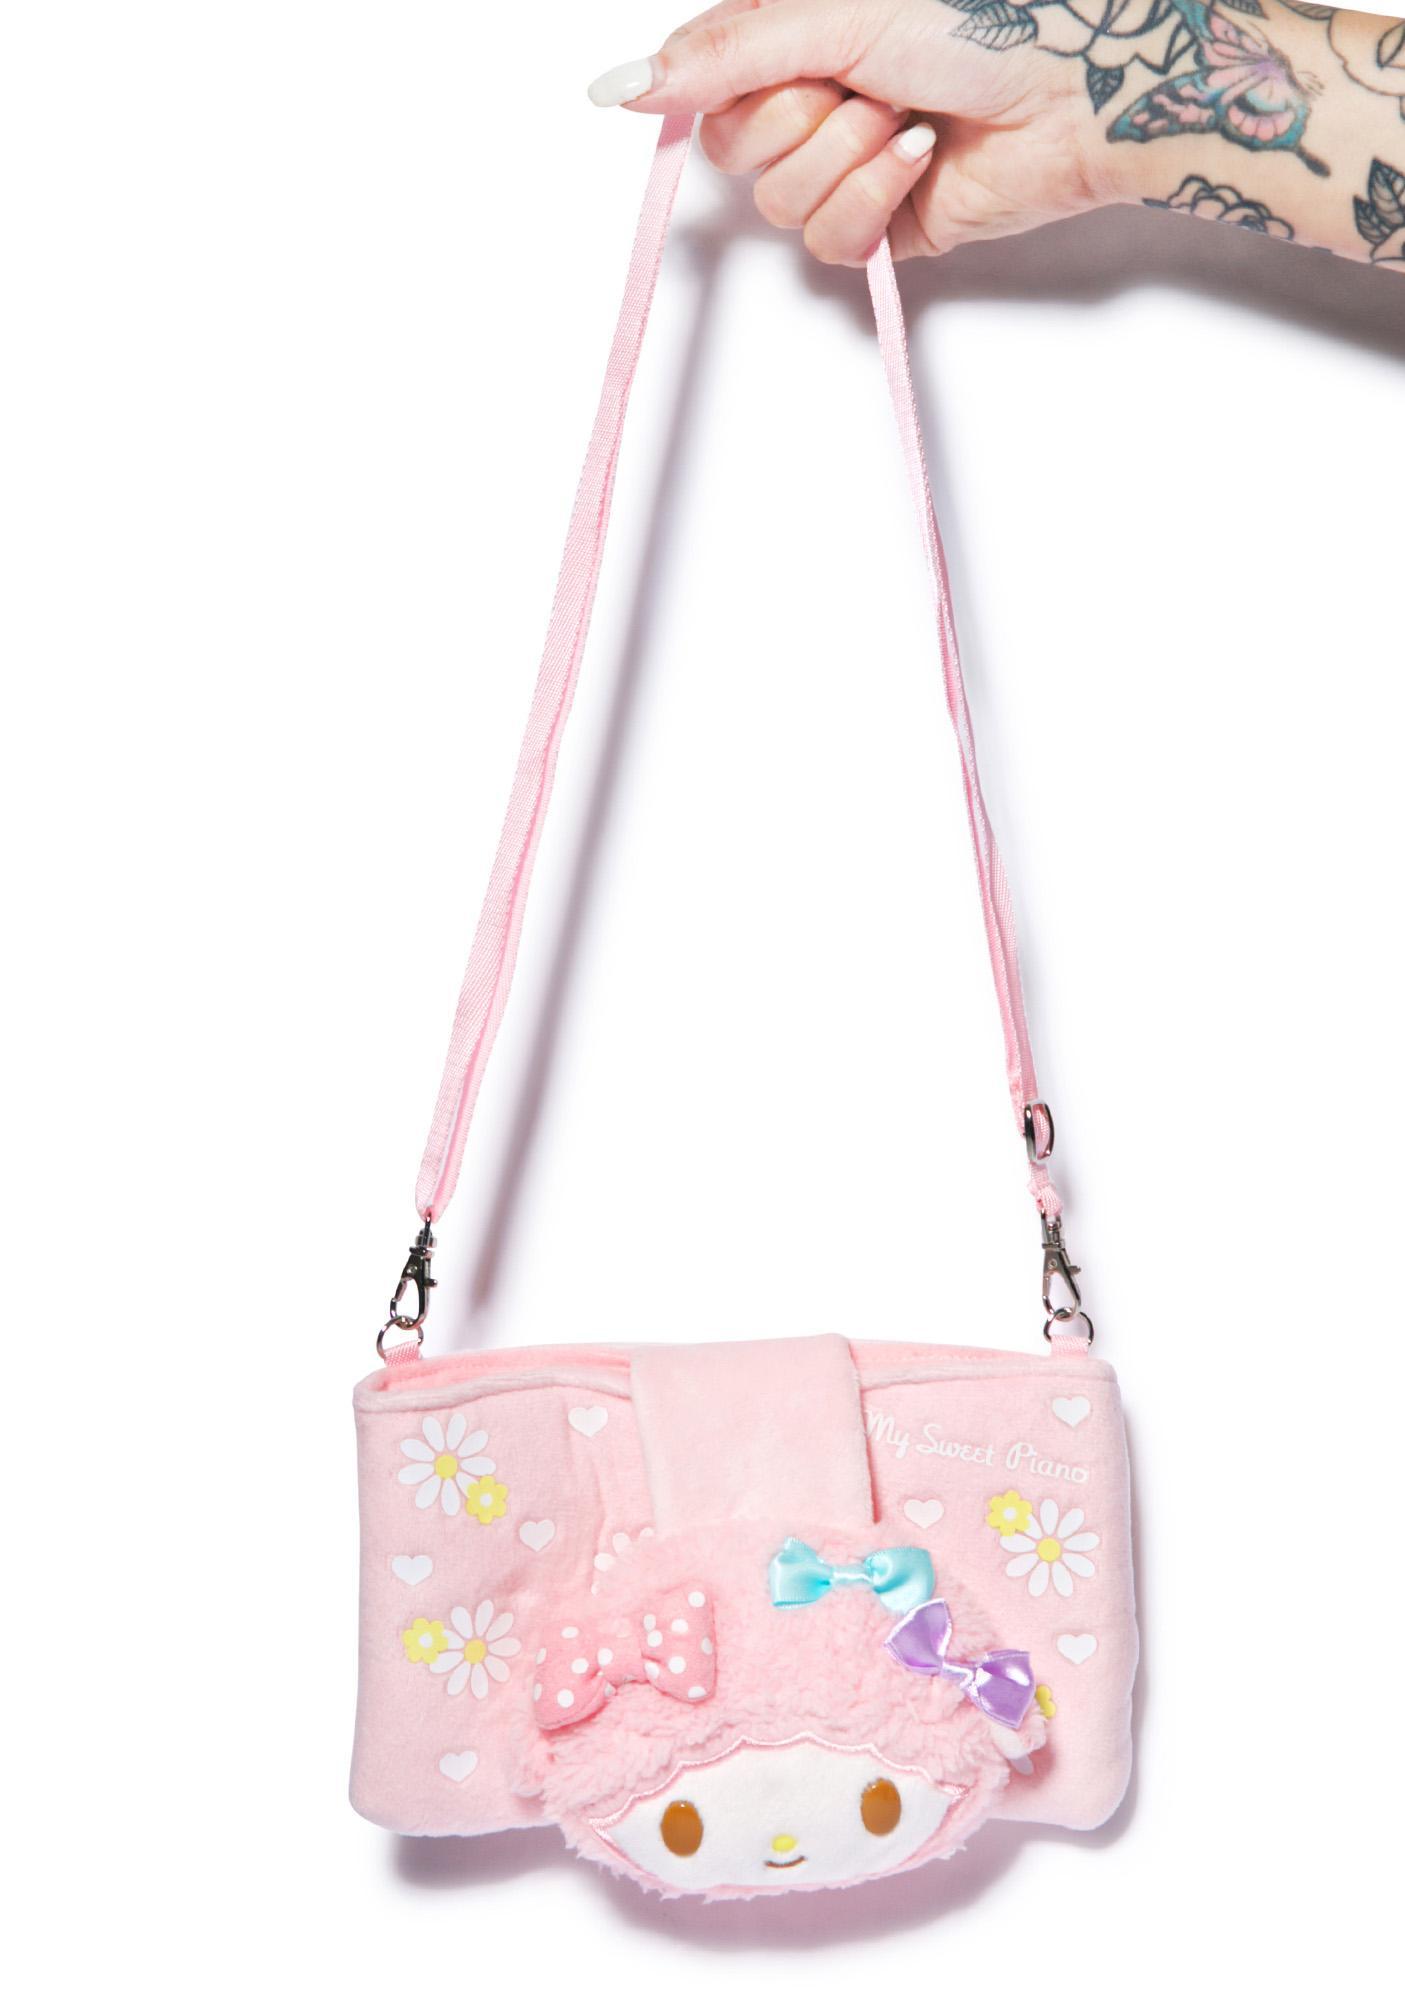 Sanrio Sweet Piano Plush Bag